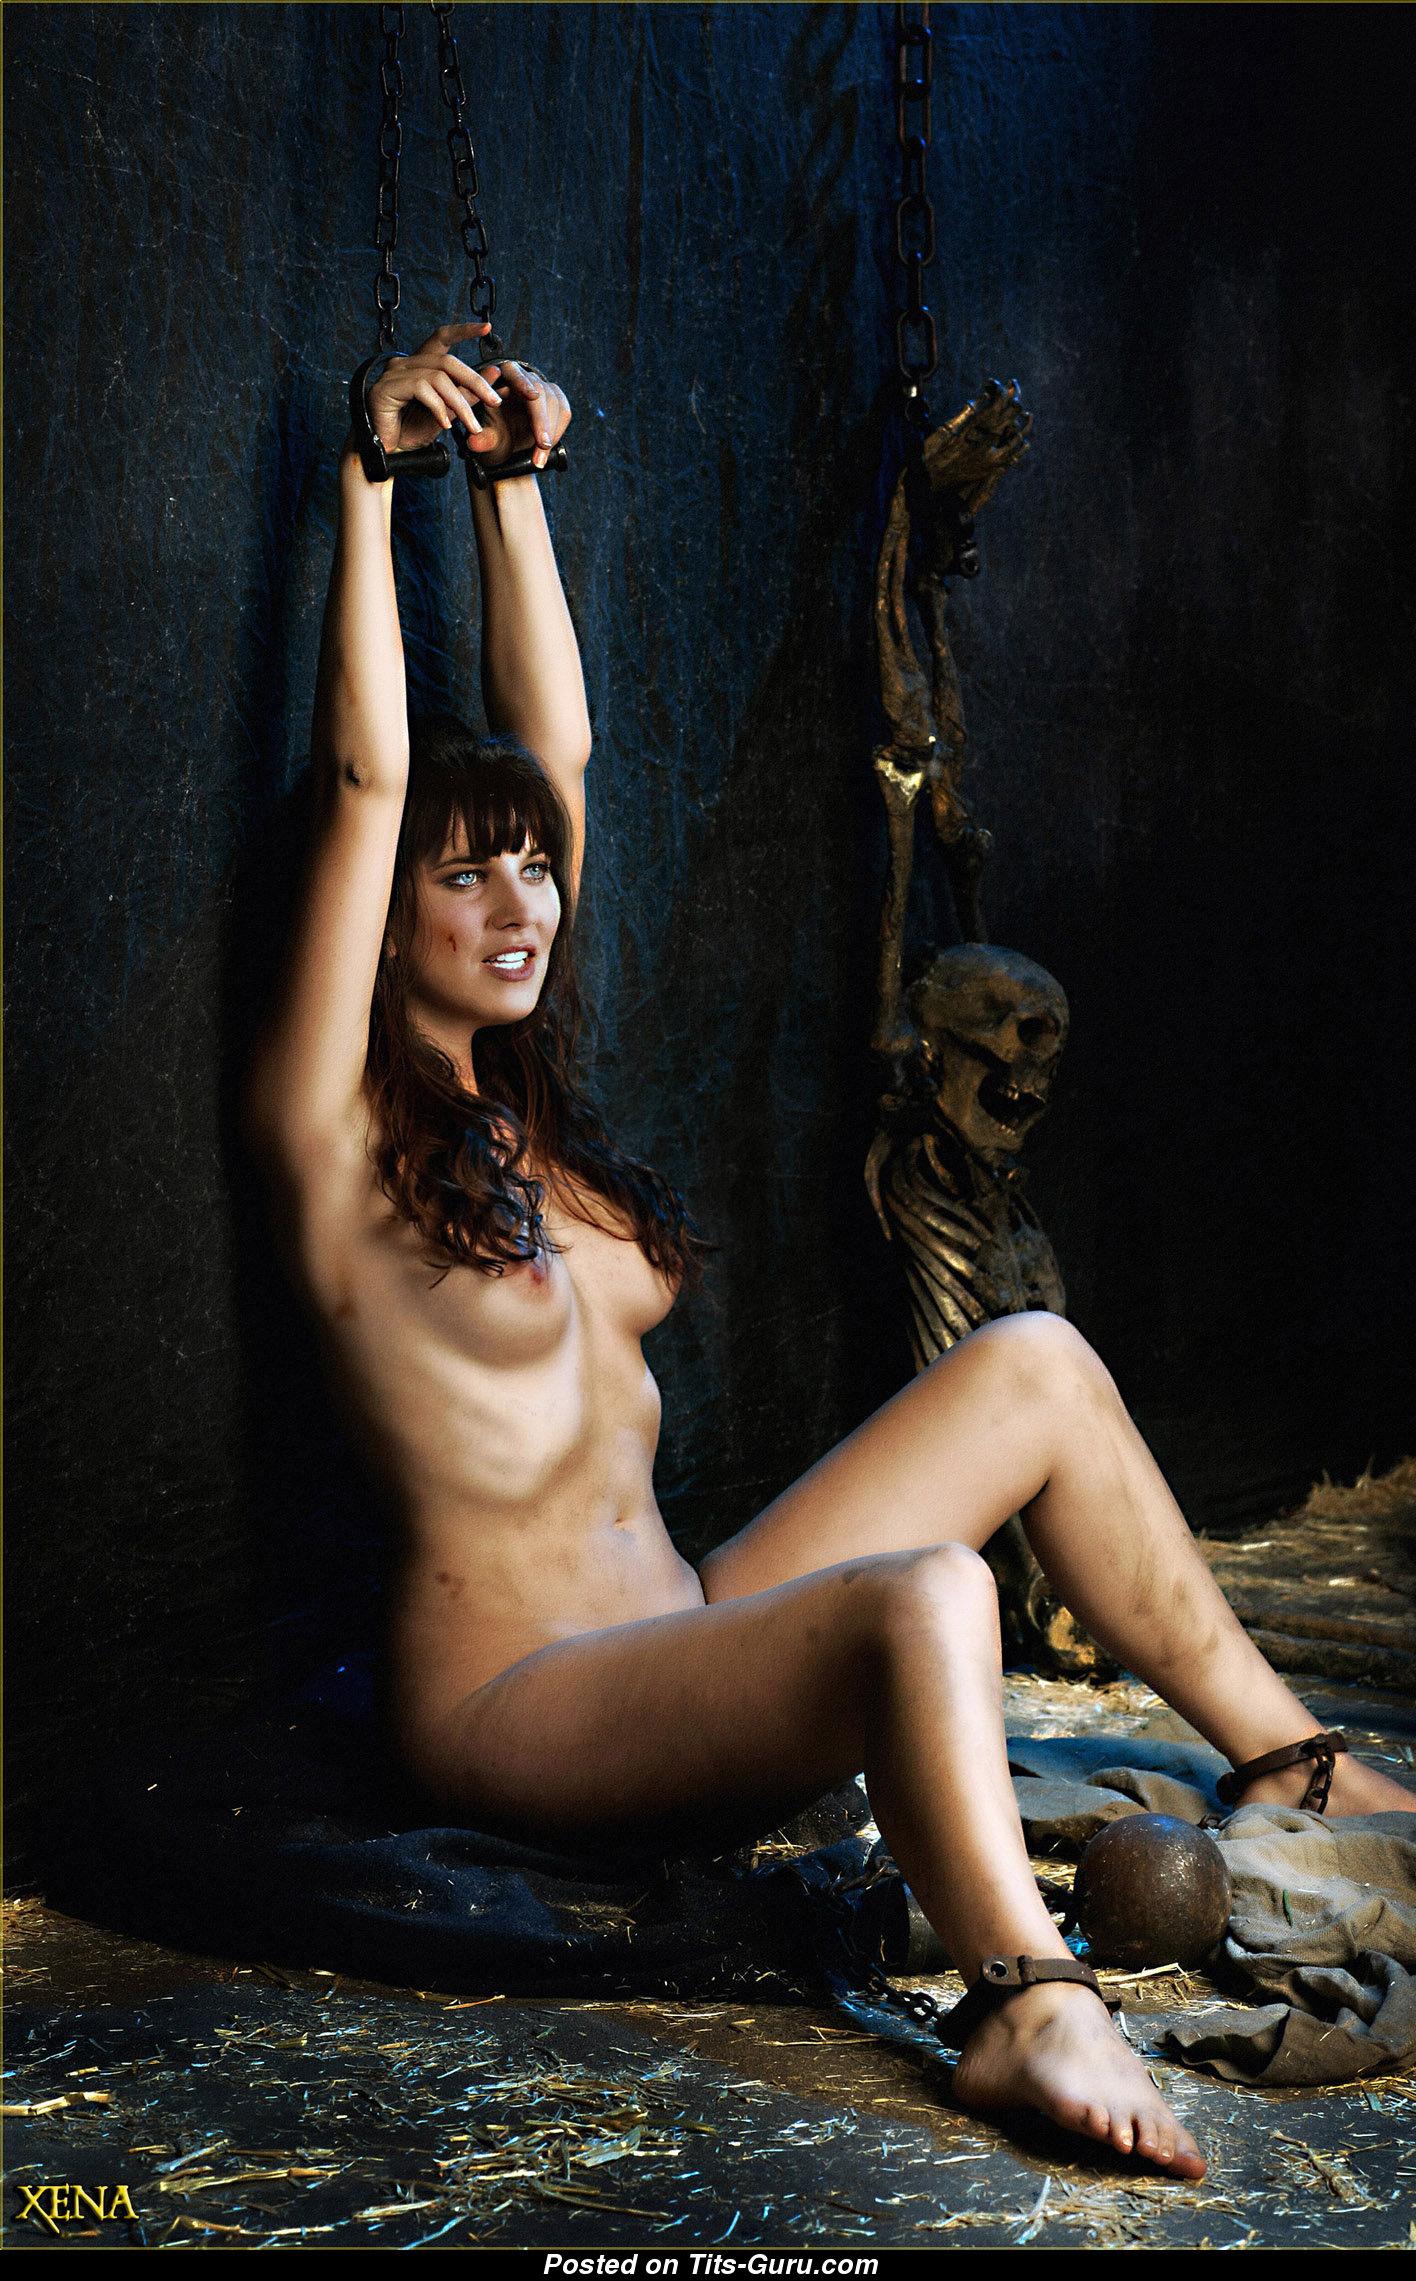 Big breast nude image-2673